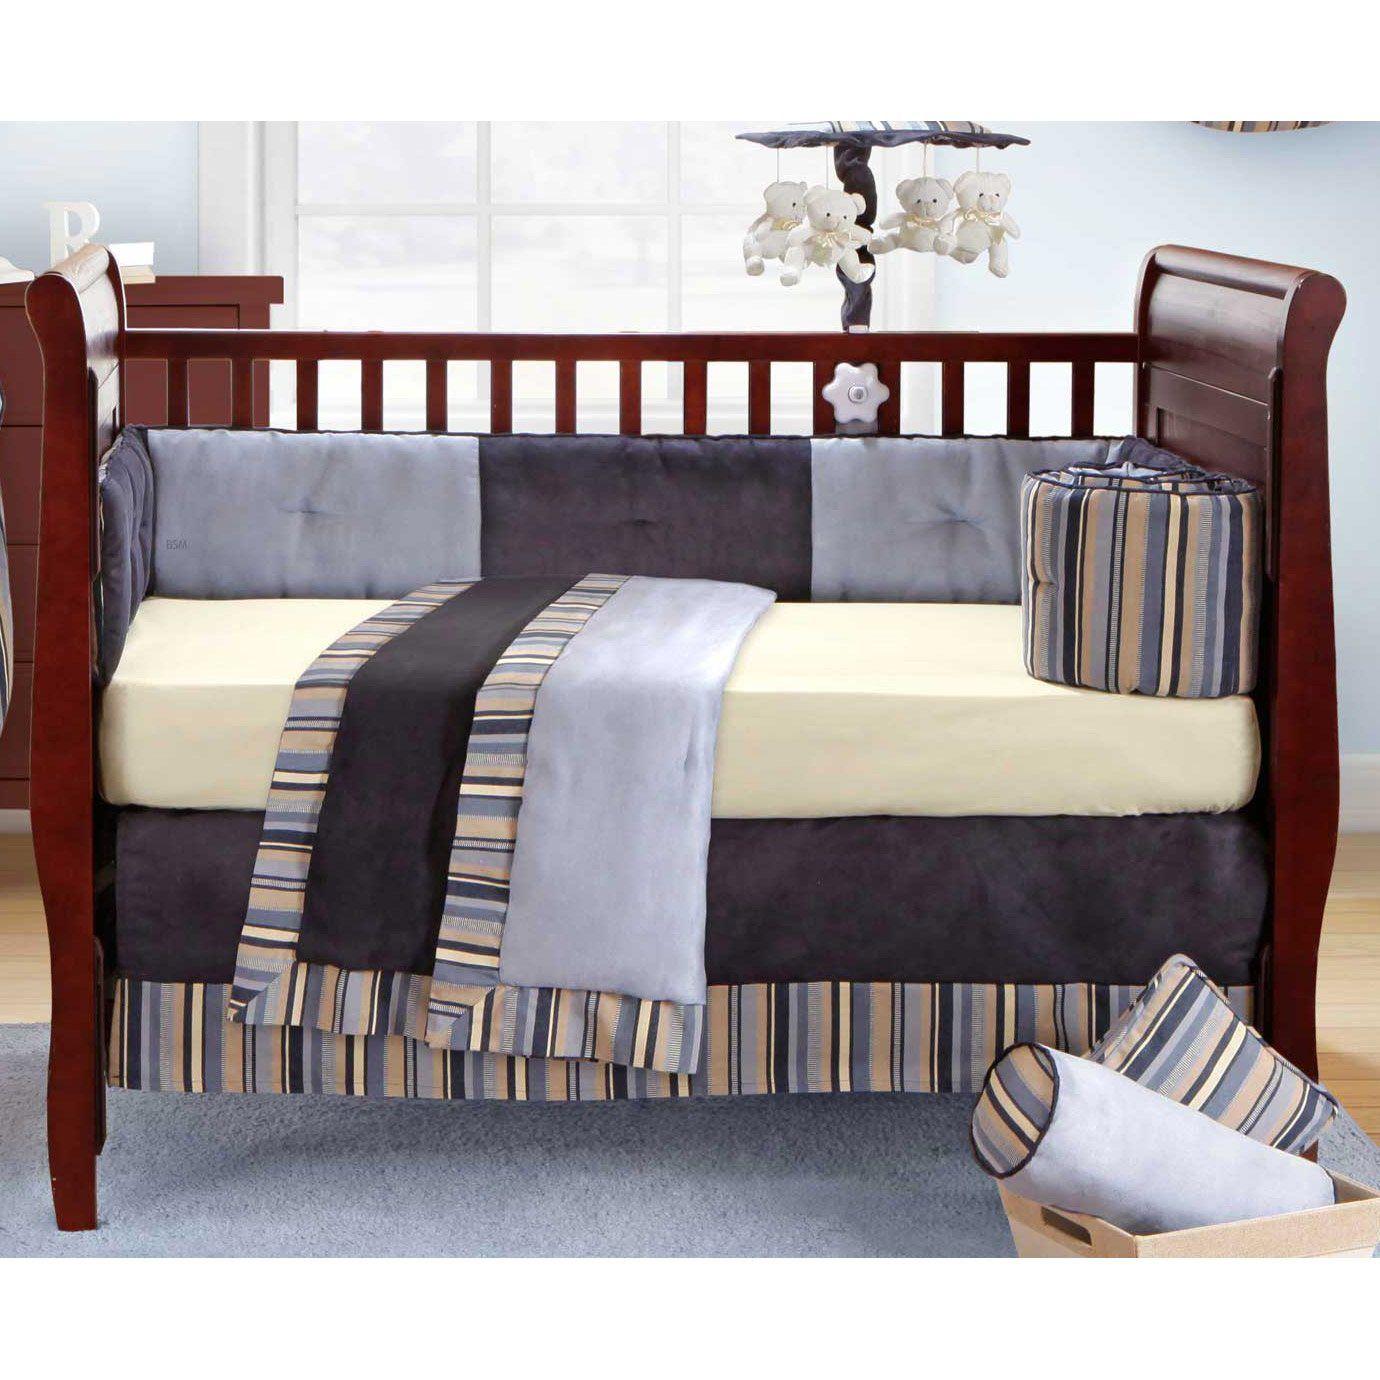 Daniel Solid Blue Navy And Cream 4 Piece Crib Set Nursery